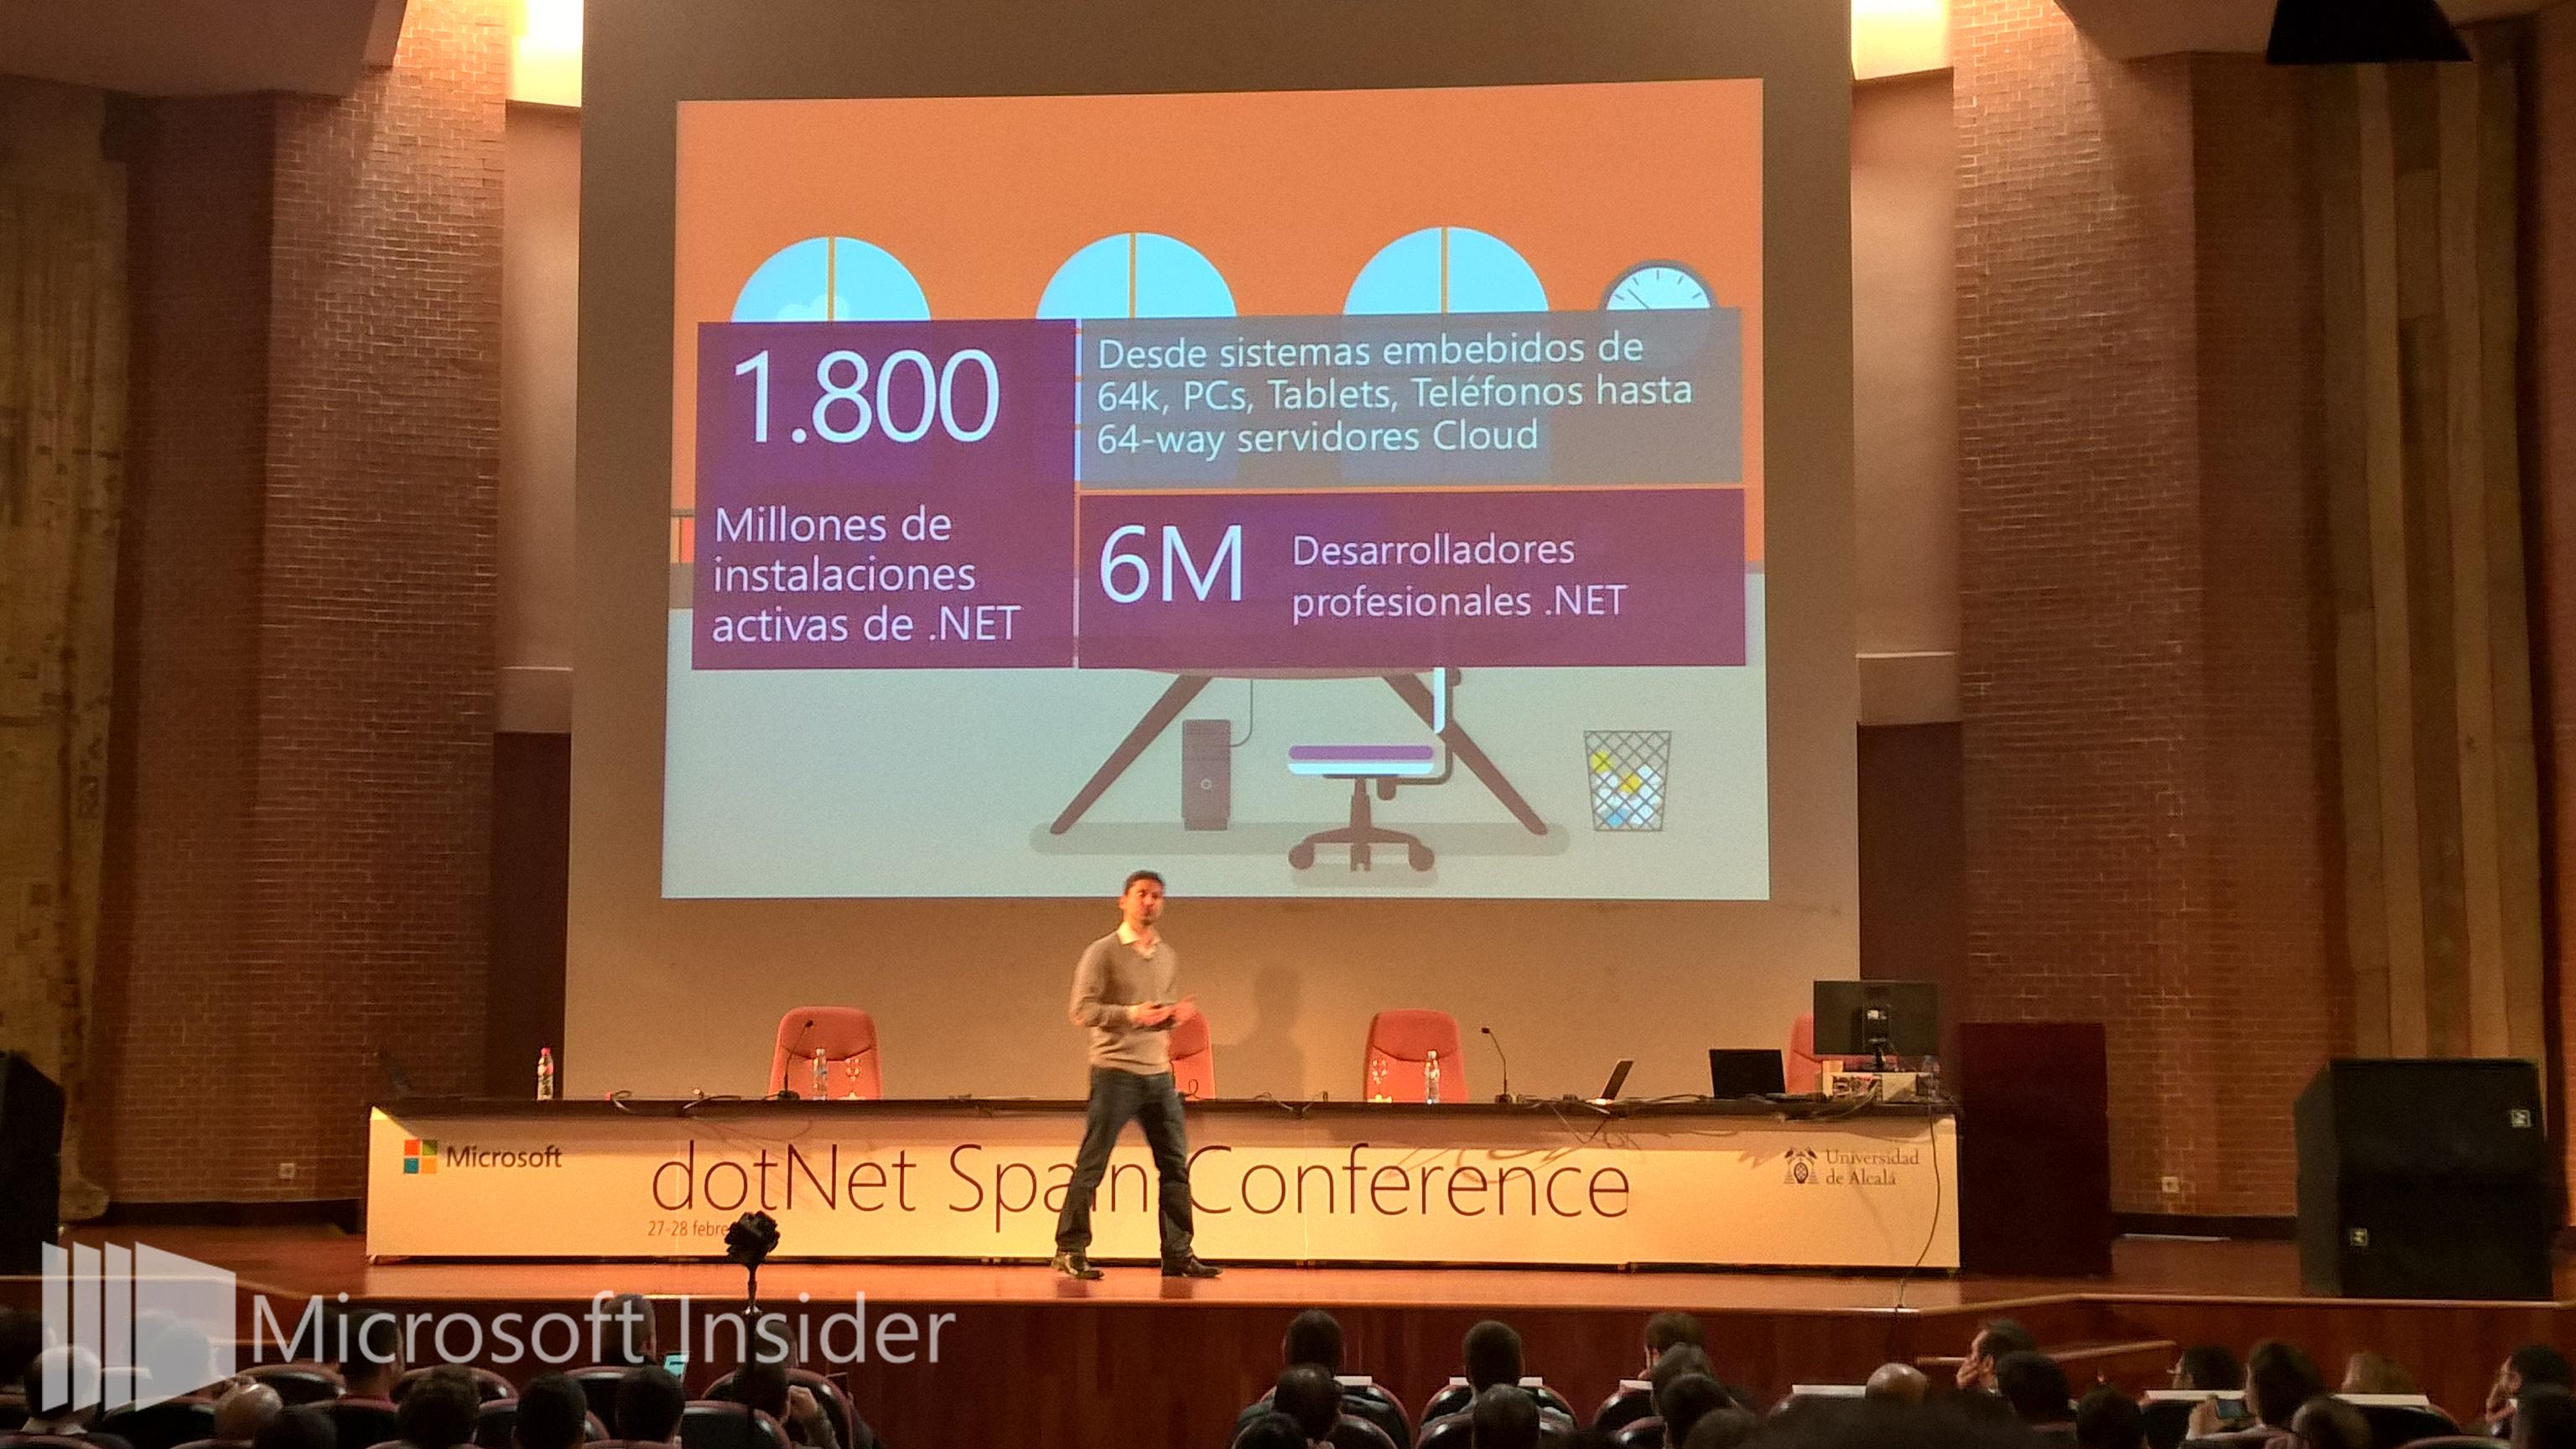 DotNET Spain Conference 02